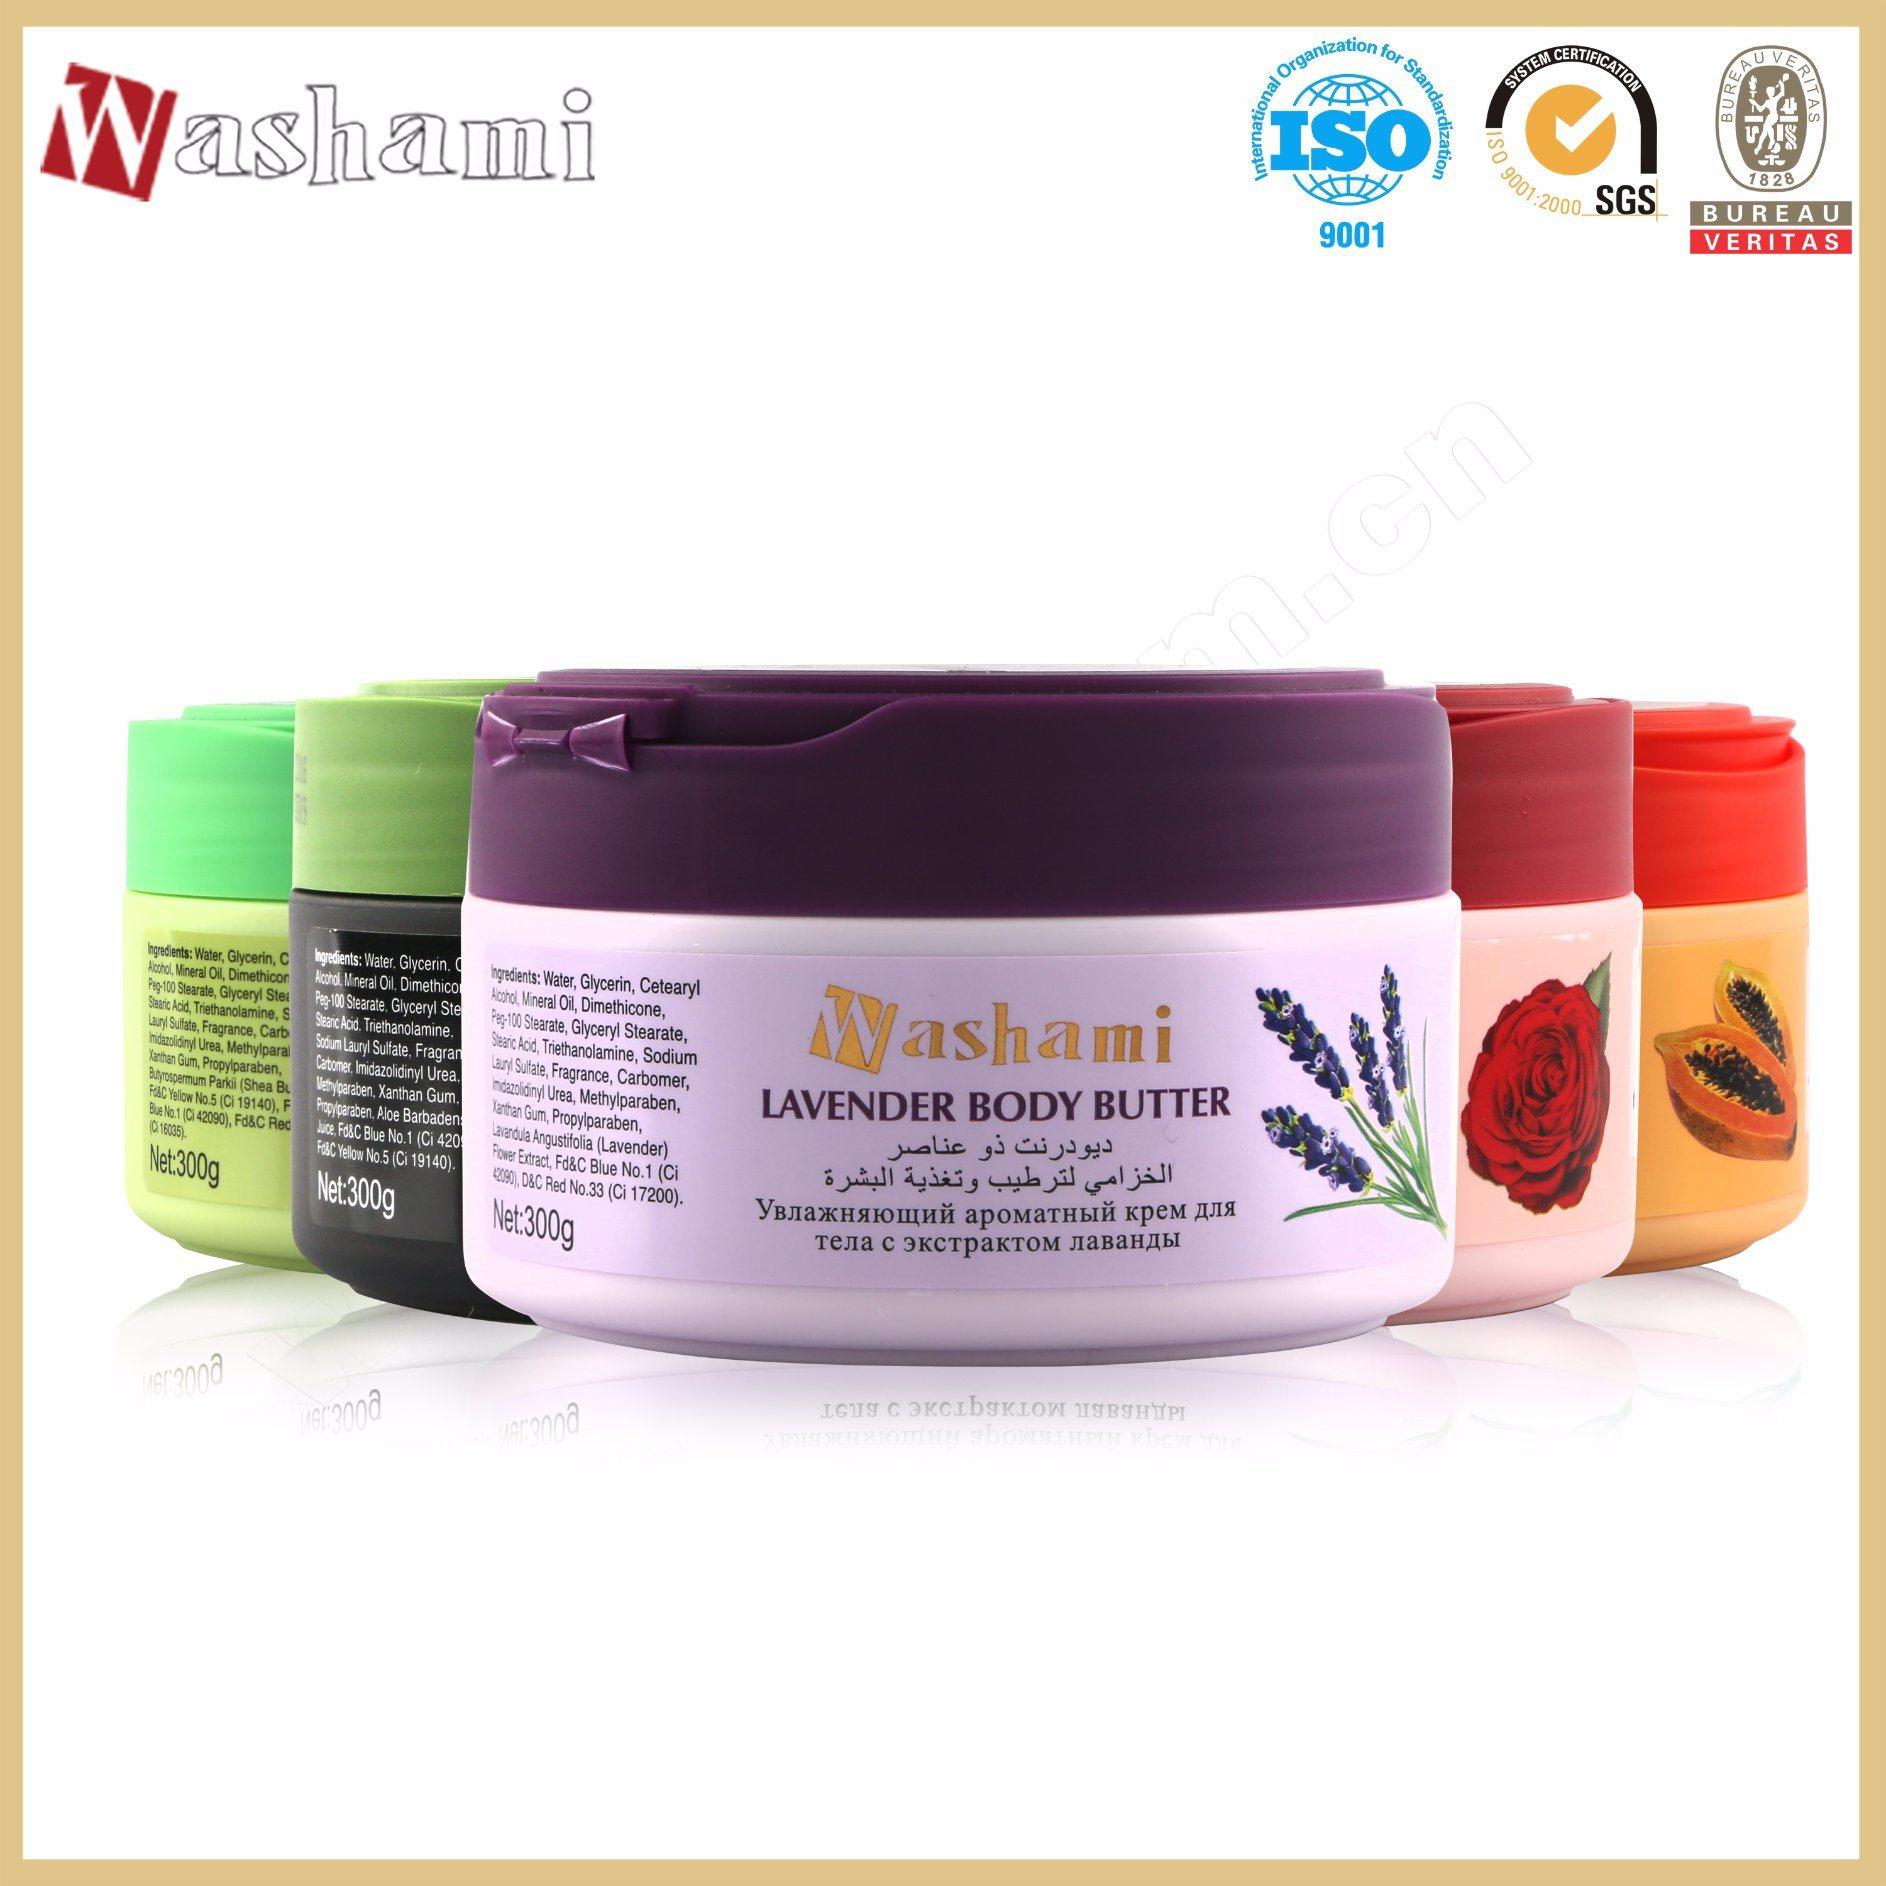 Washami Best Quality Natuer Essence Body Butter Cream